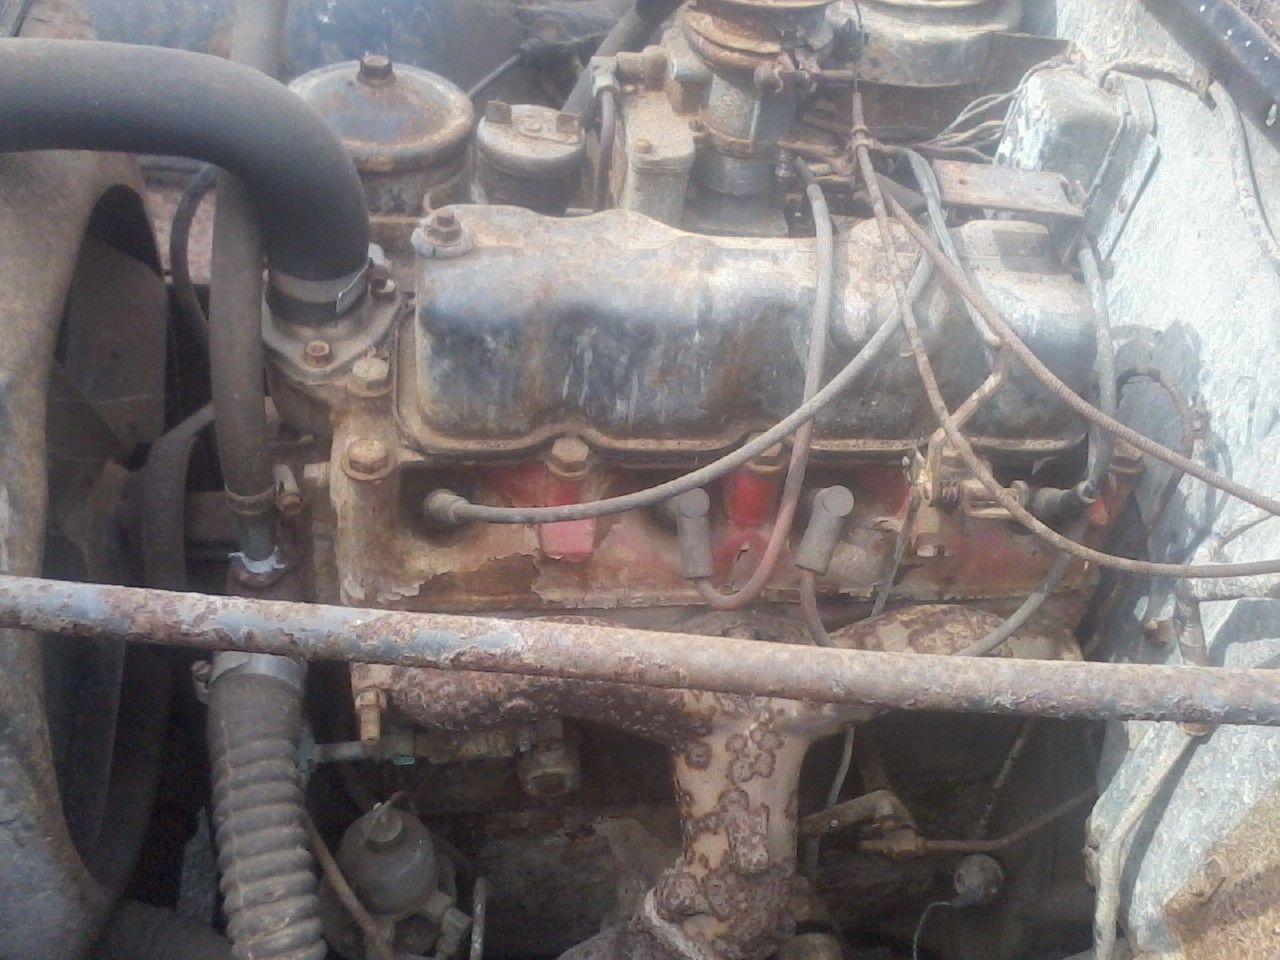 Willys Jeep 134 Engine Diagram 1945 Diagrams F Head Cu In Cylinder 1280x960